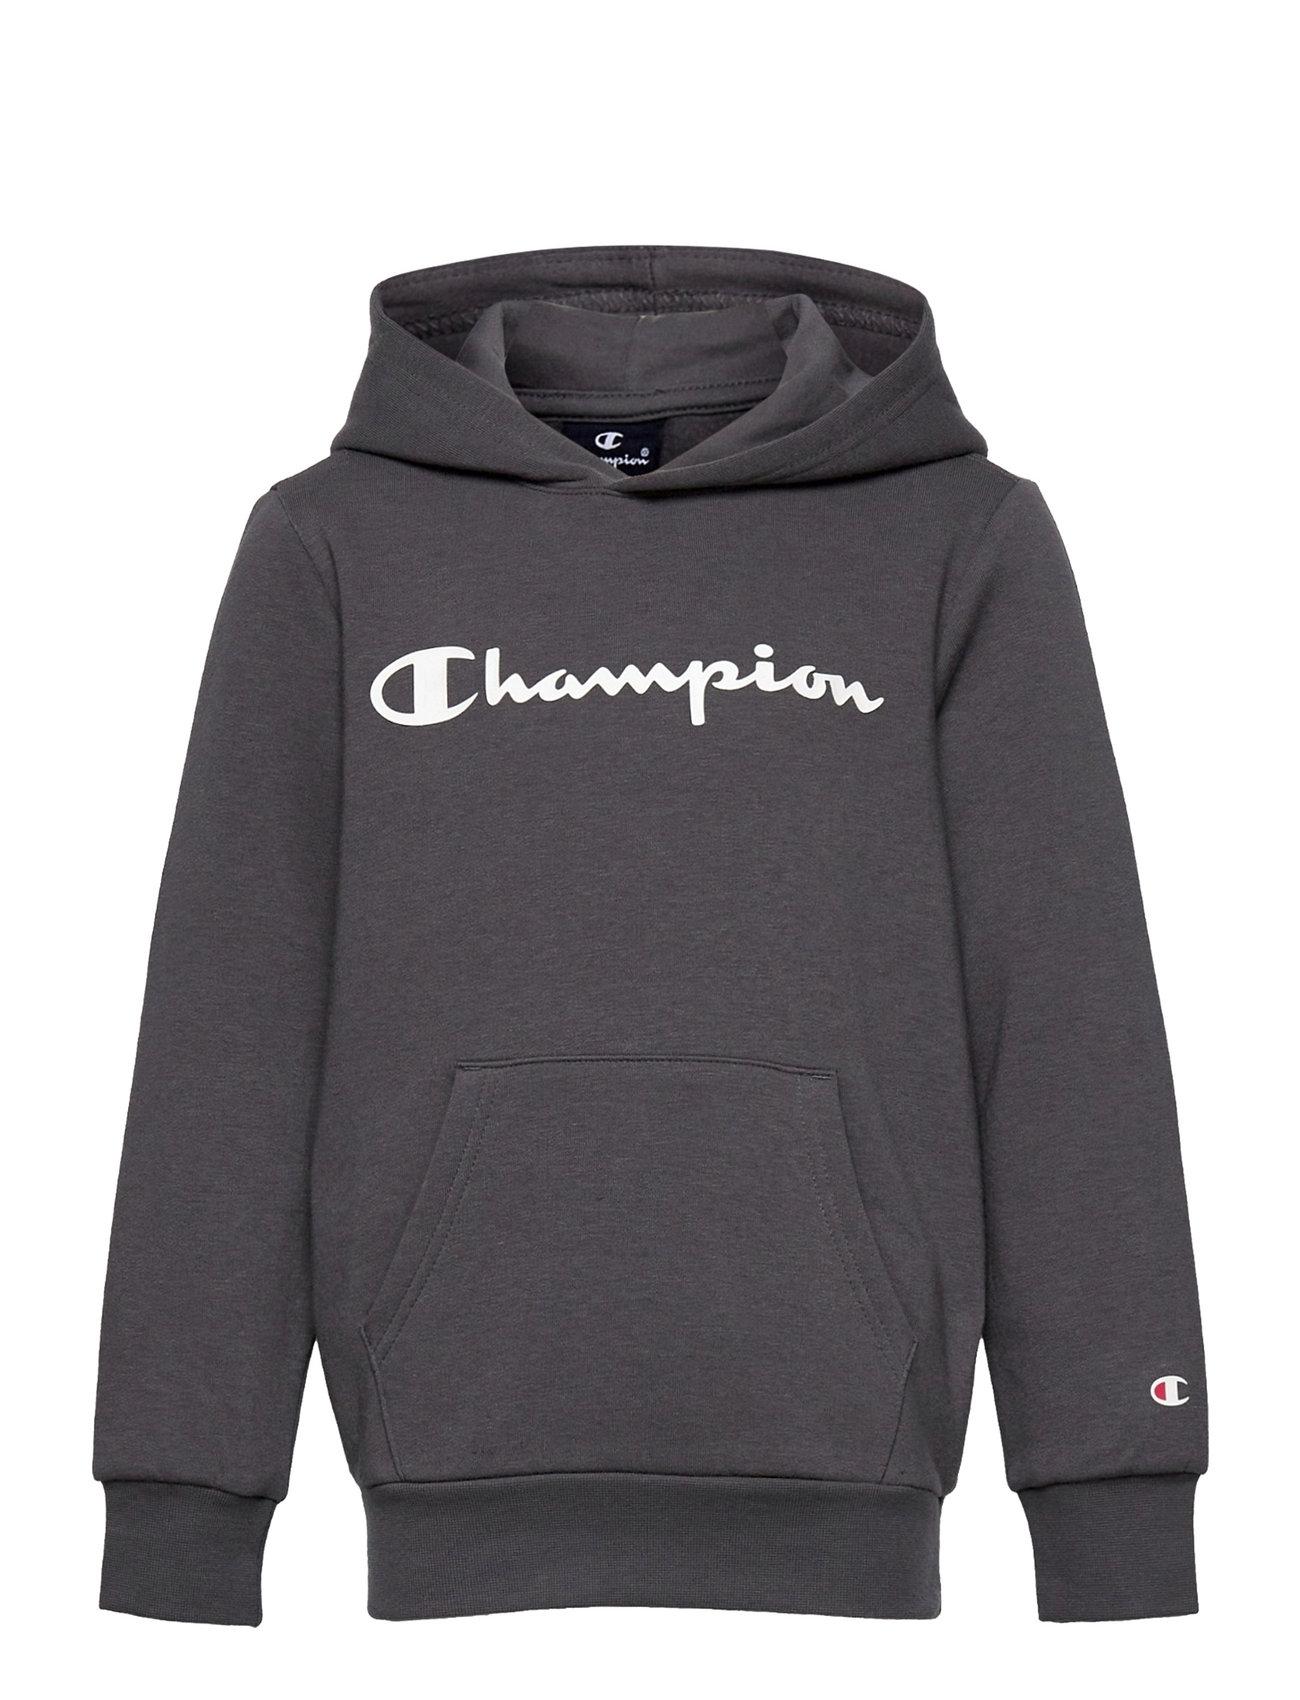 Hooded Sweatshirt Hoodie Trøje Grå Champion